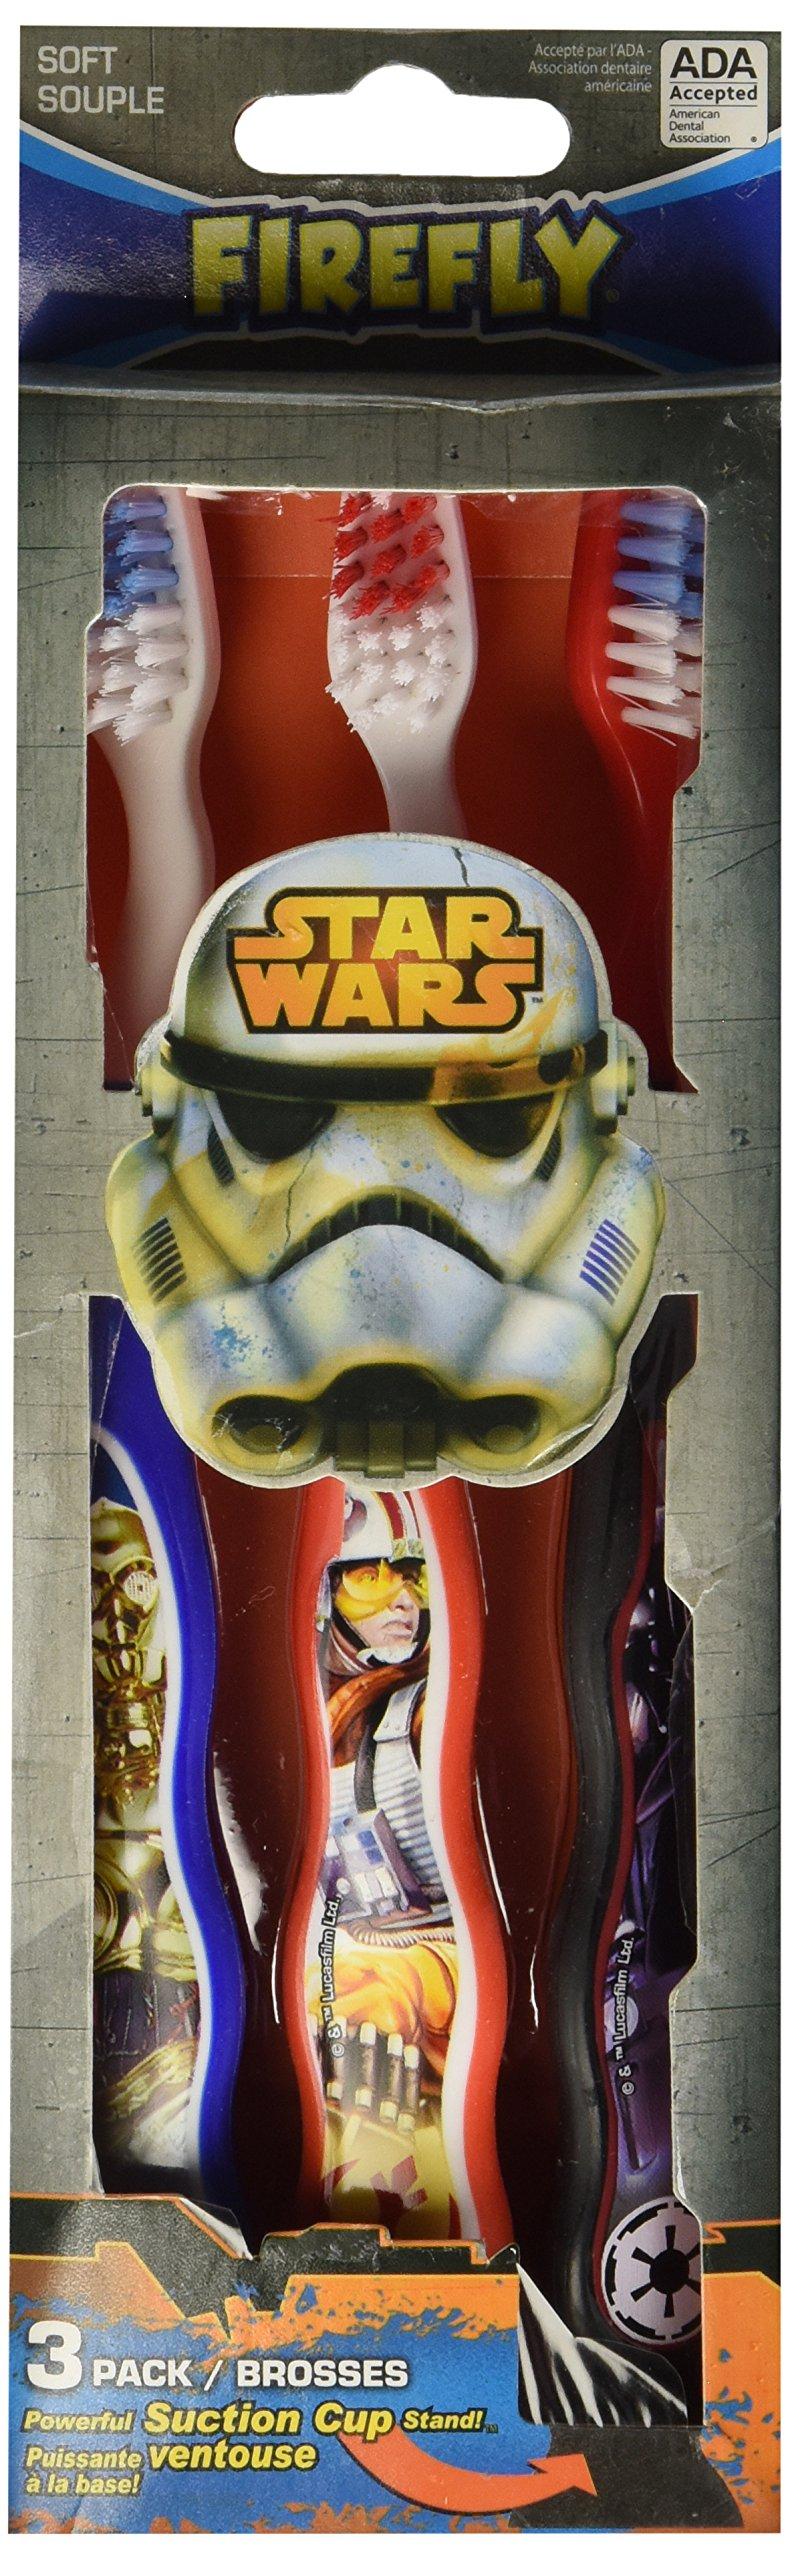 Firefly Toothbrush - Star Wars - 3